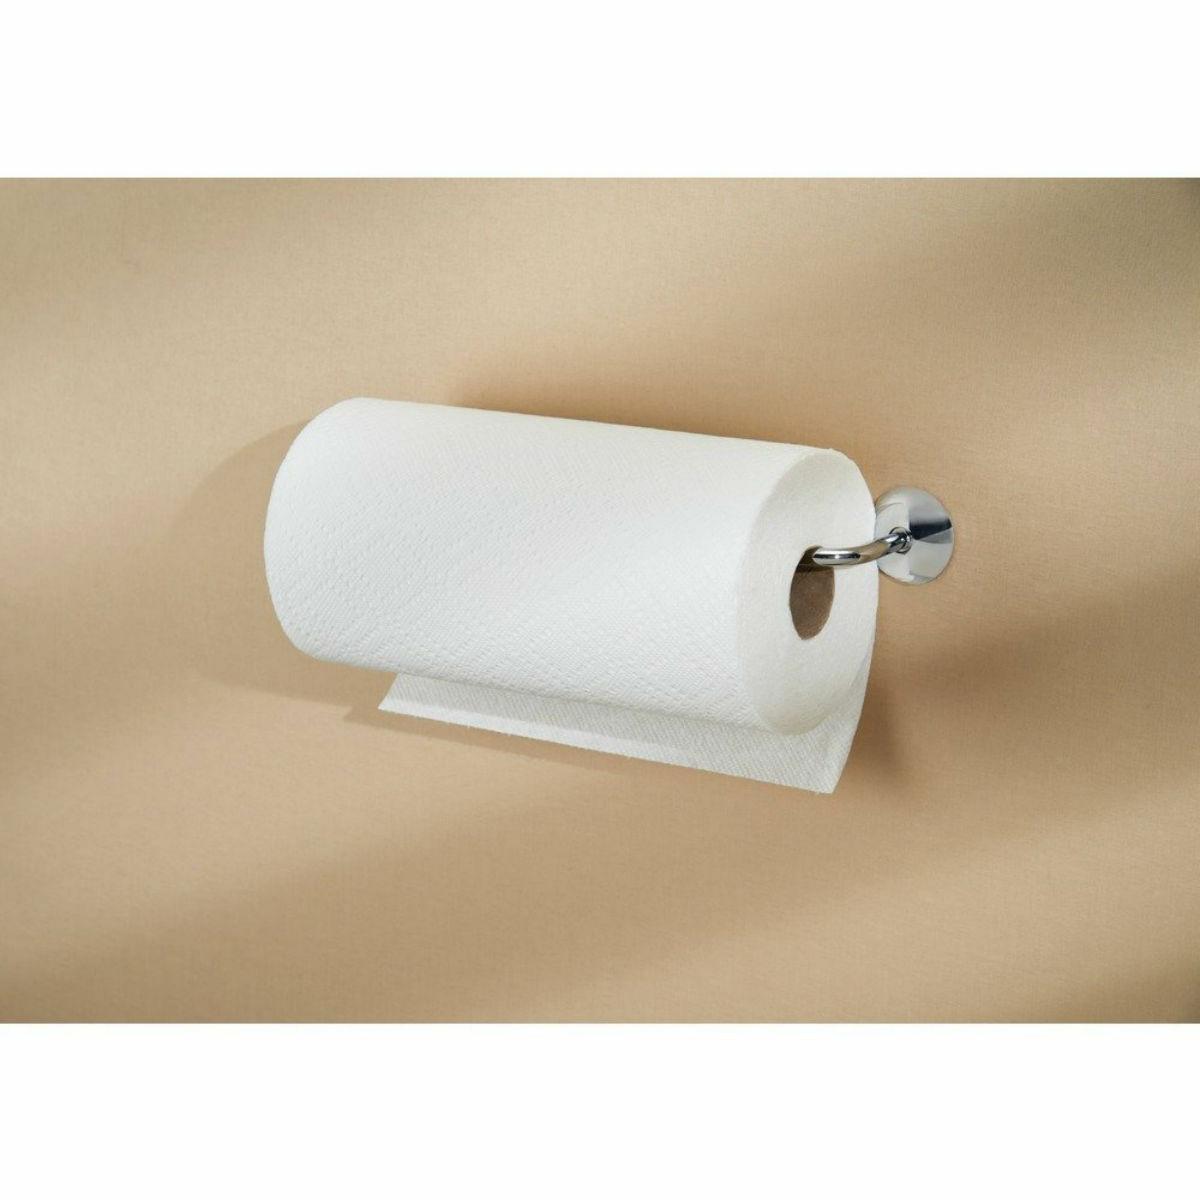 Kitchen Paper Towel Roll Holder Under Cabinet